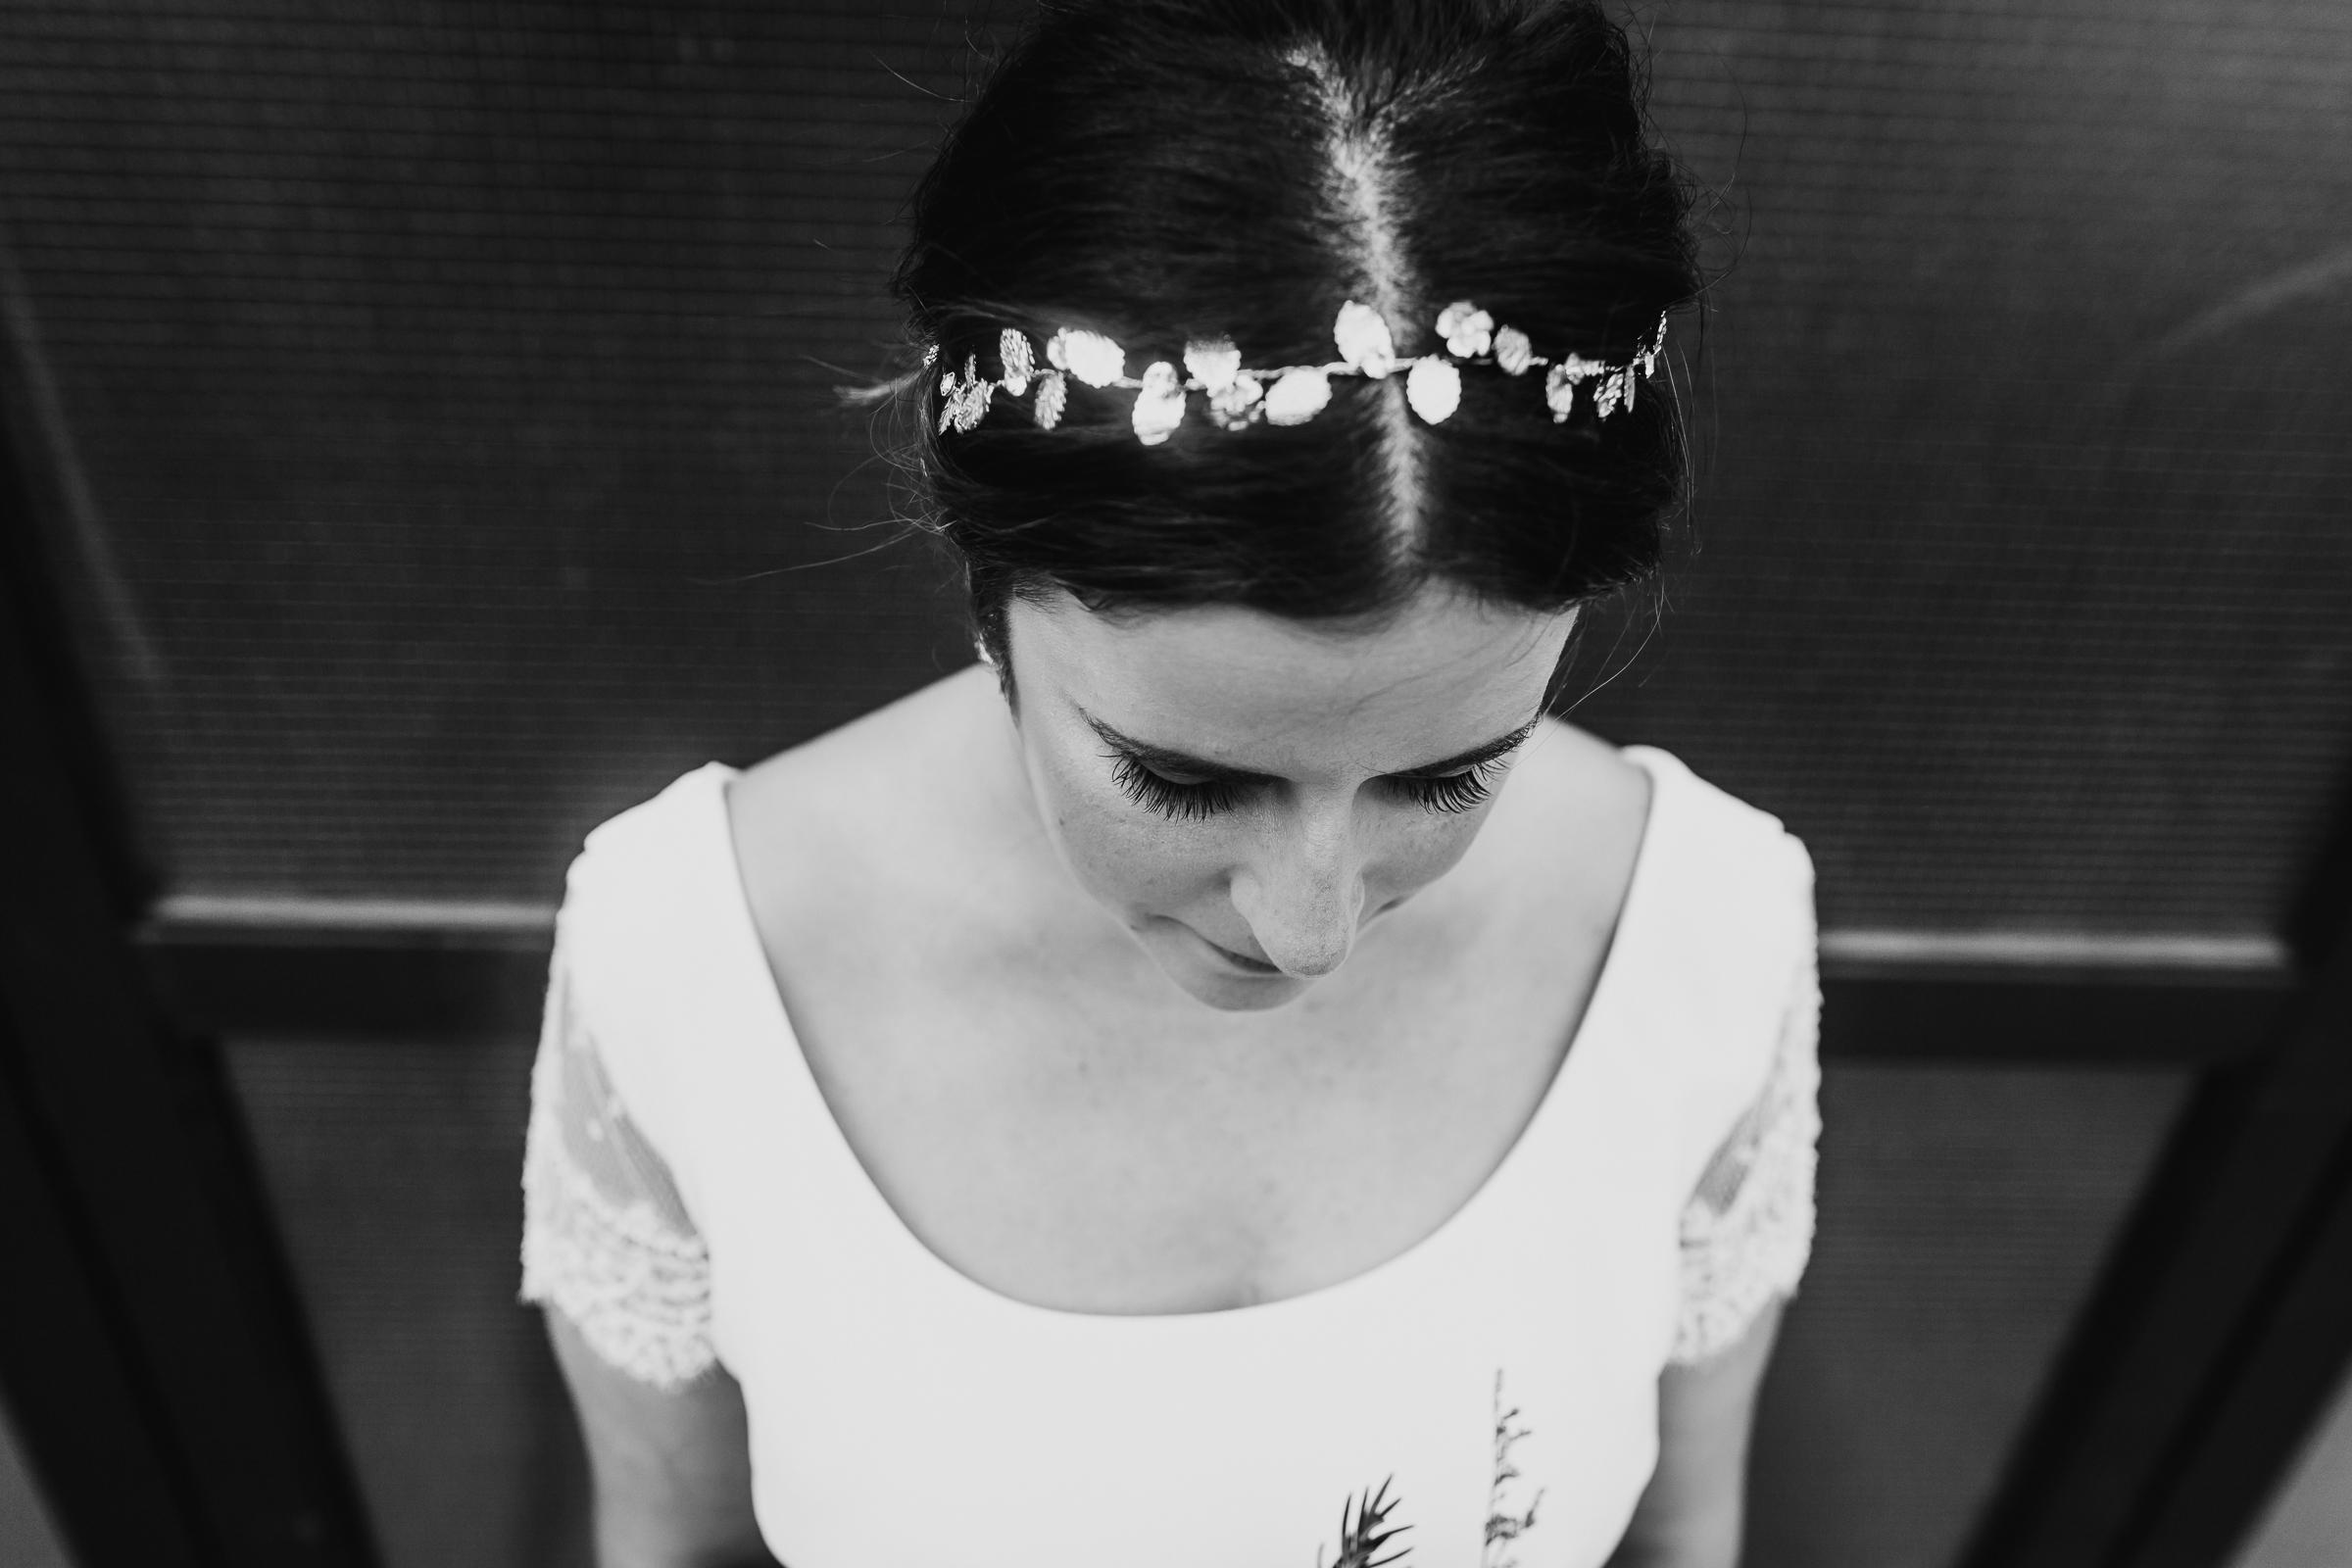 501-Union-Brooklyn-Fine-Art-Documentary-Wedding-Photographer-58.jpg